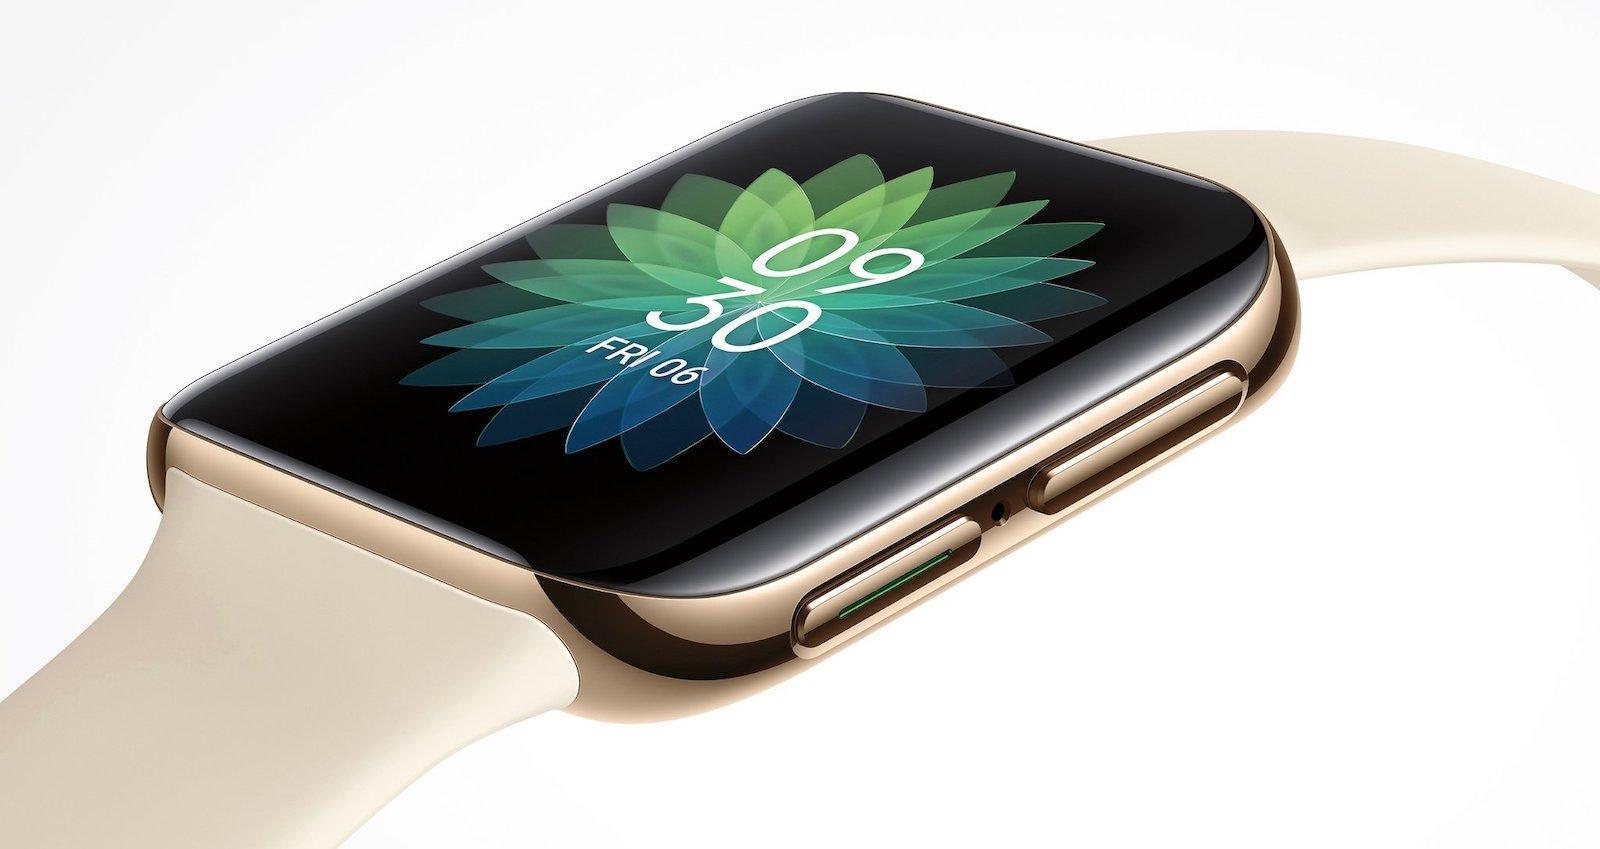 OPPO объявила о старте продаж в России умных часов OPPO Watch (oppo watch arrives on fcc european launch nearing)